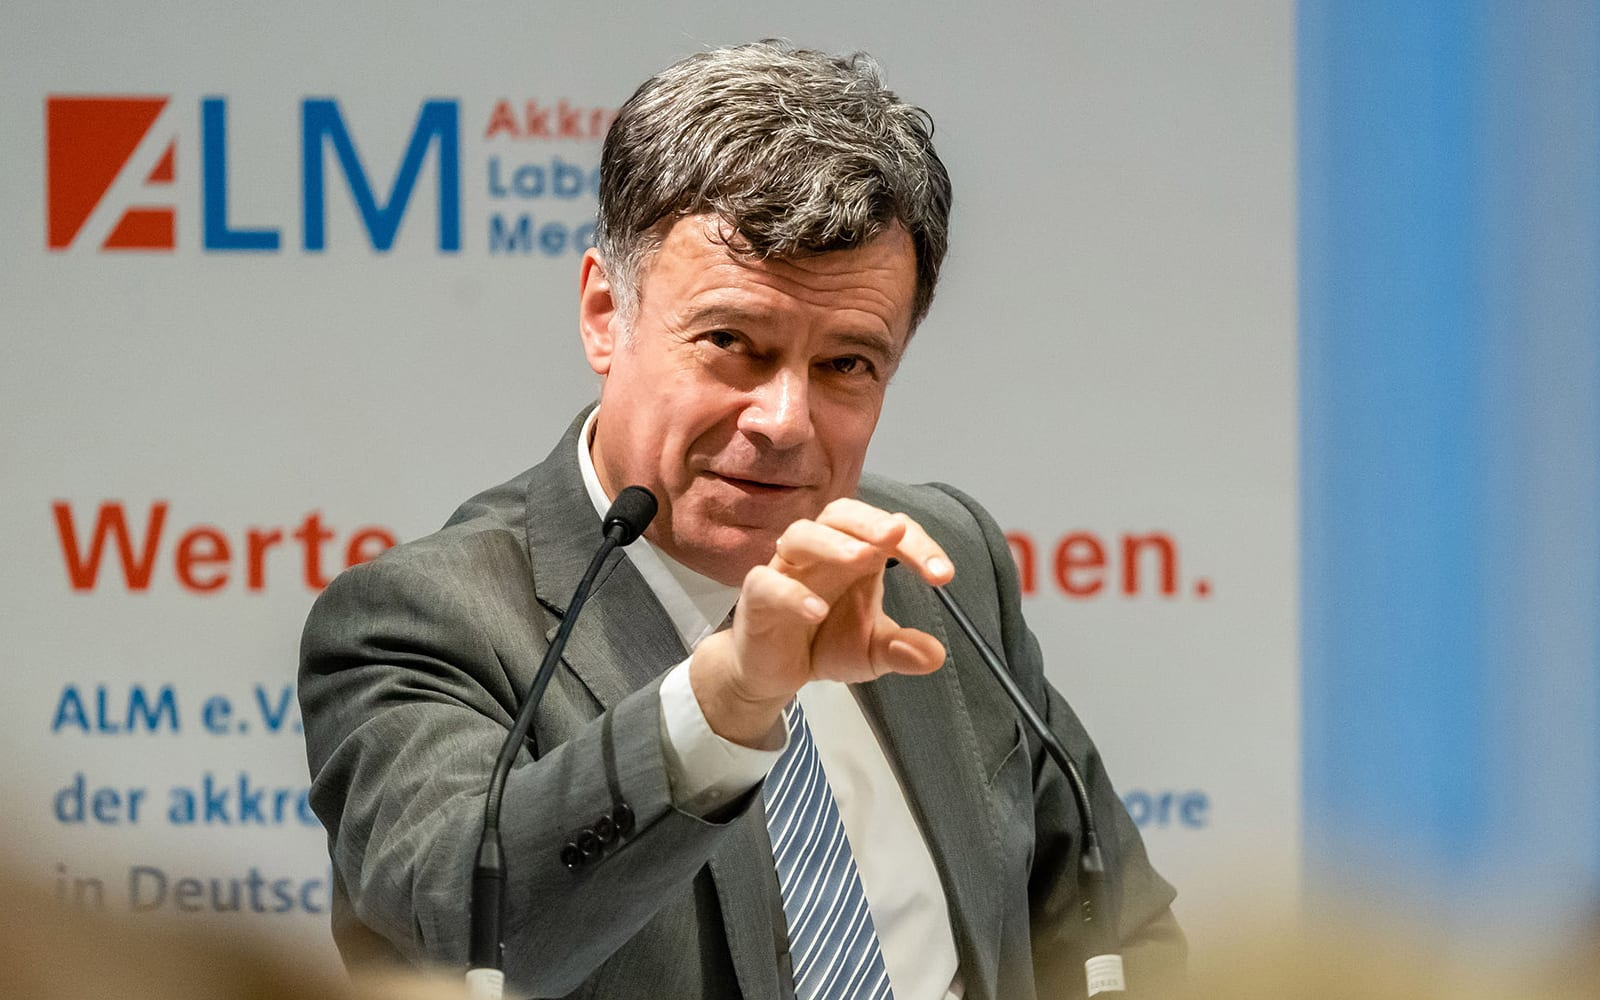 Prof. Giovanni Maio